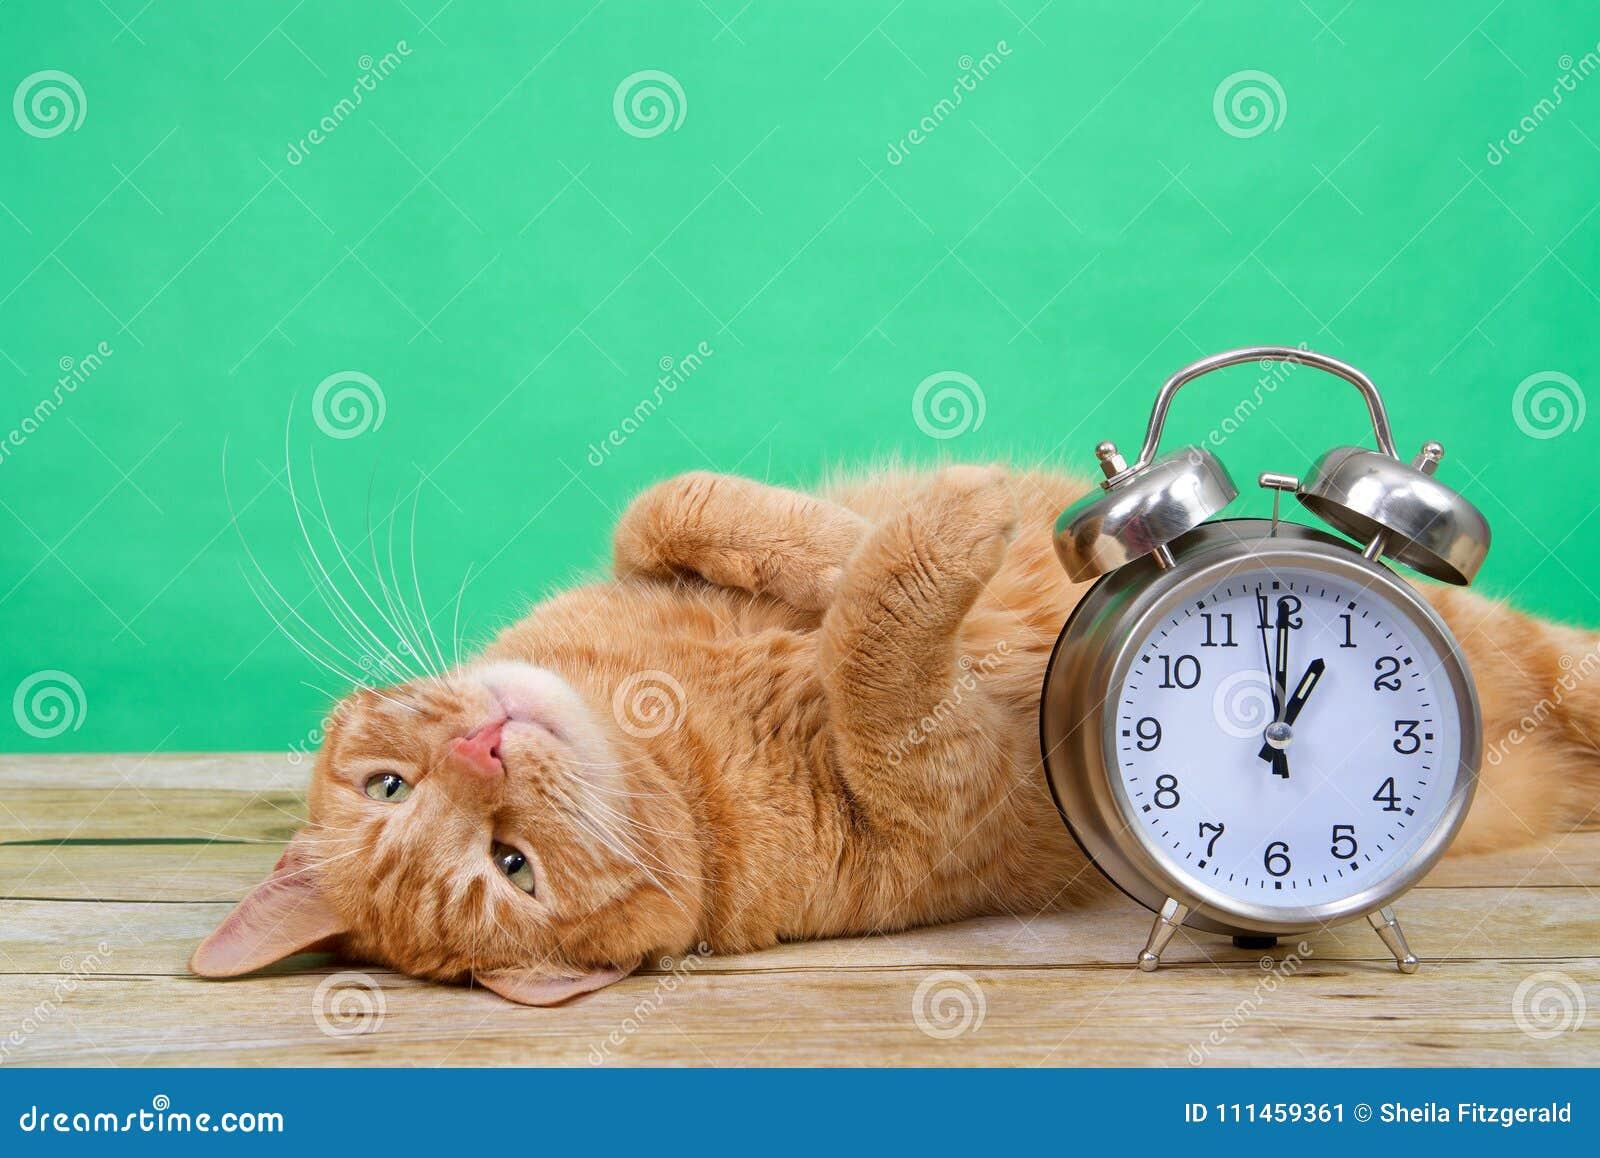 Daylight Savings Tabby cat laying upside down